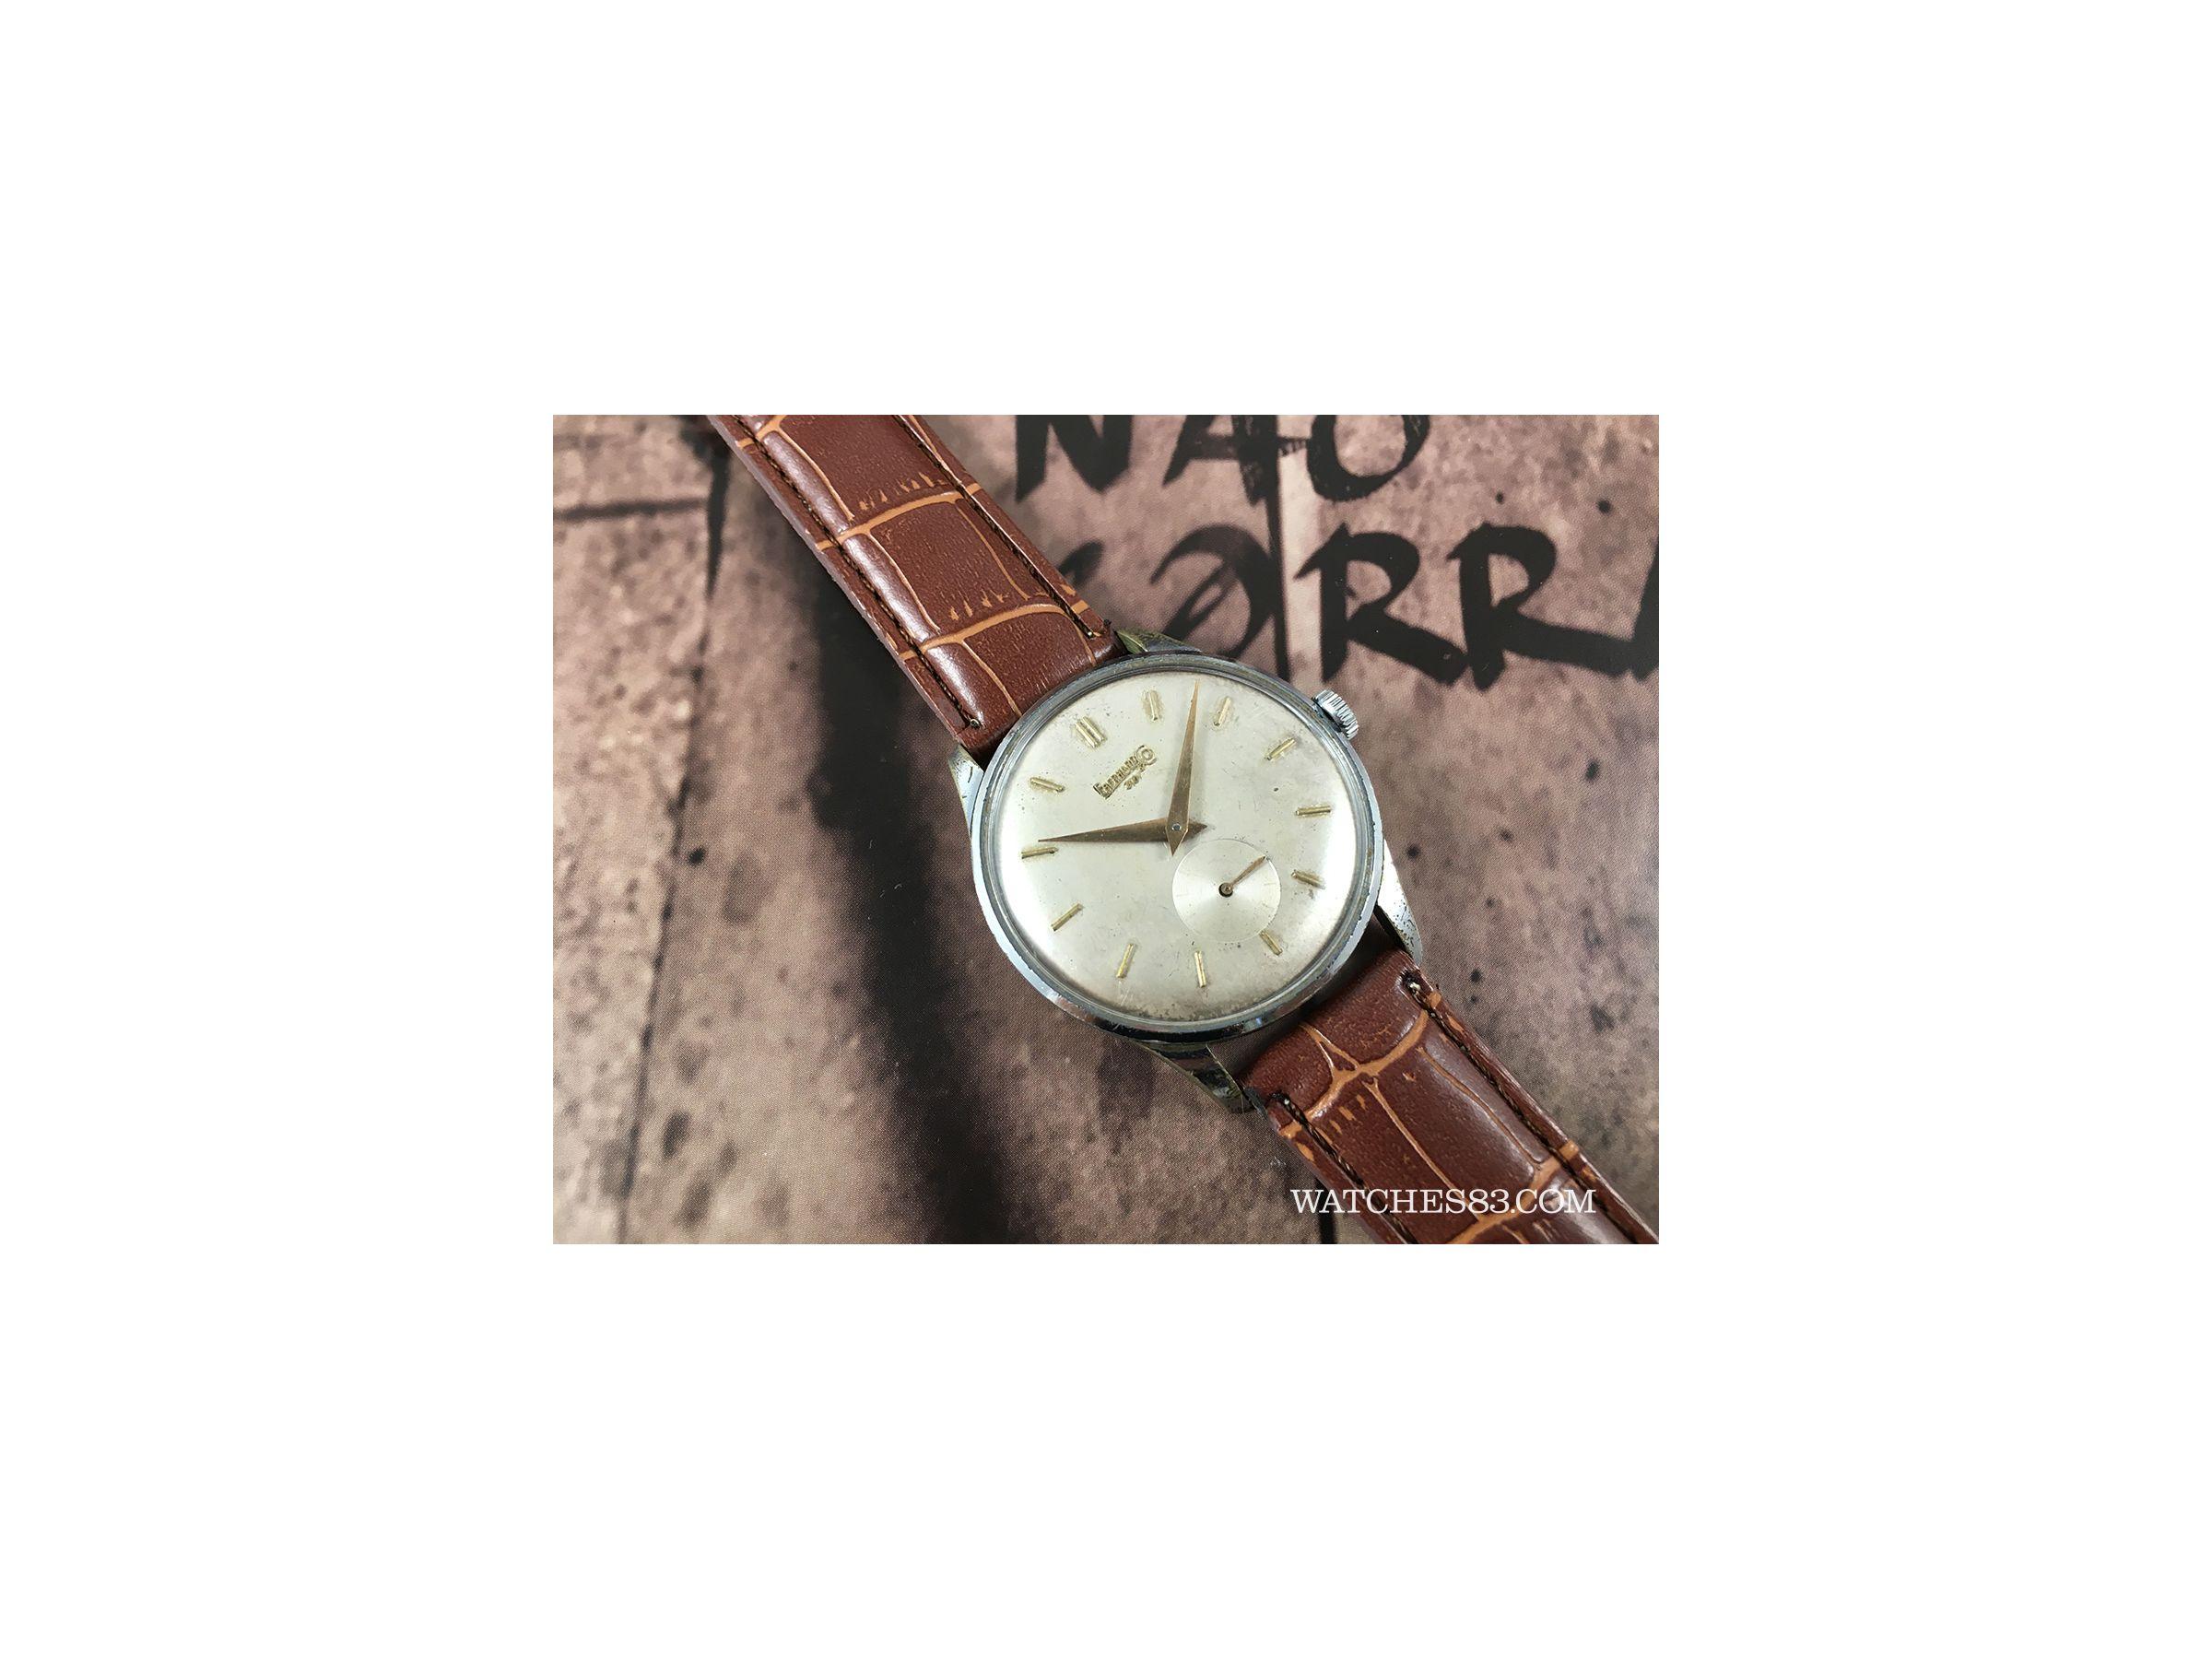 Vintage swiss watch hand winding Eberhard & Co Mod. 30